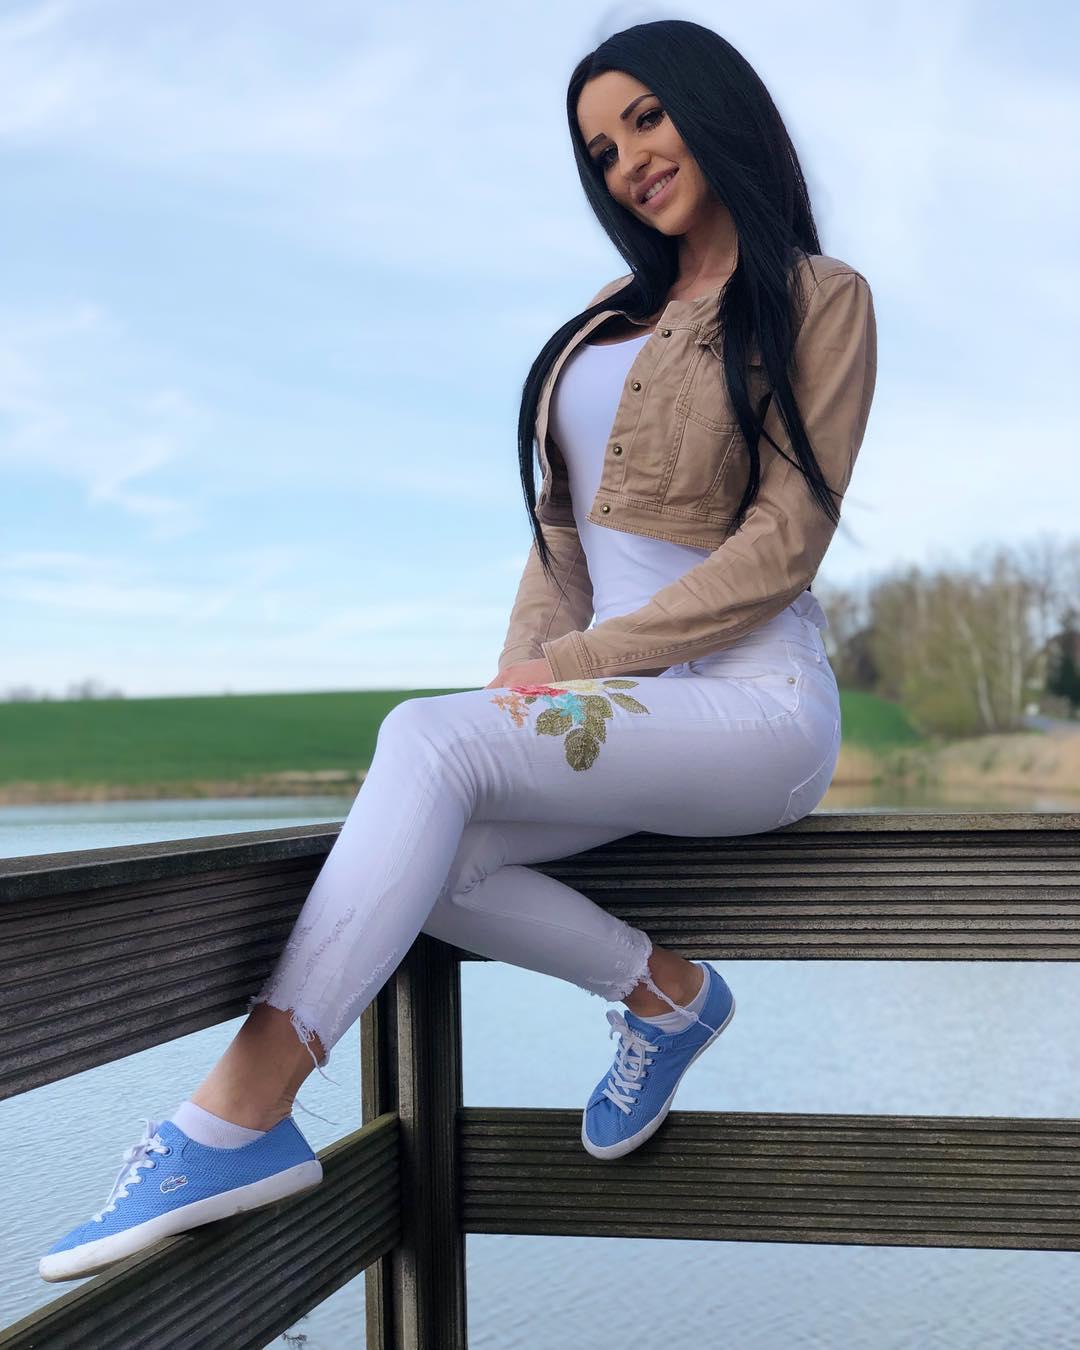 Natalia-Fitnesska-Wallpapers-Insta-Fit-Bio-3